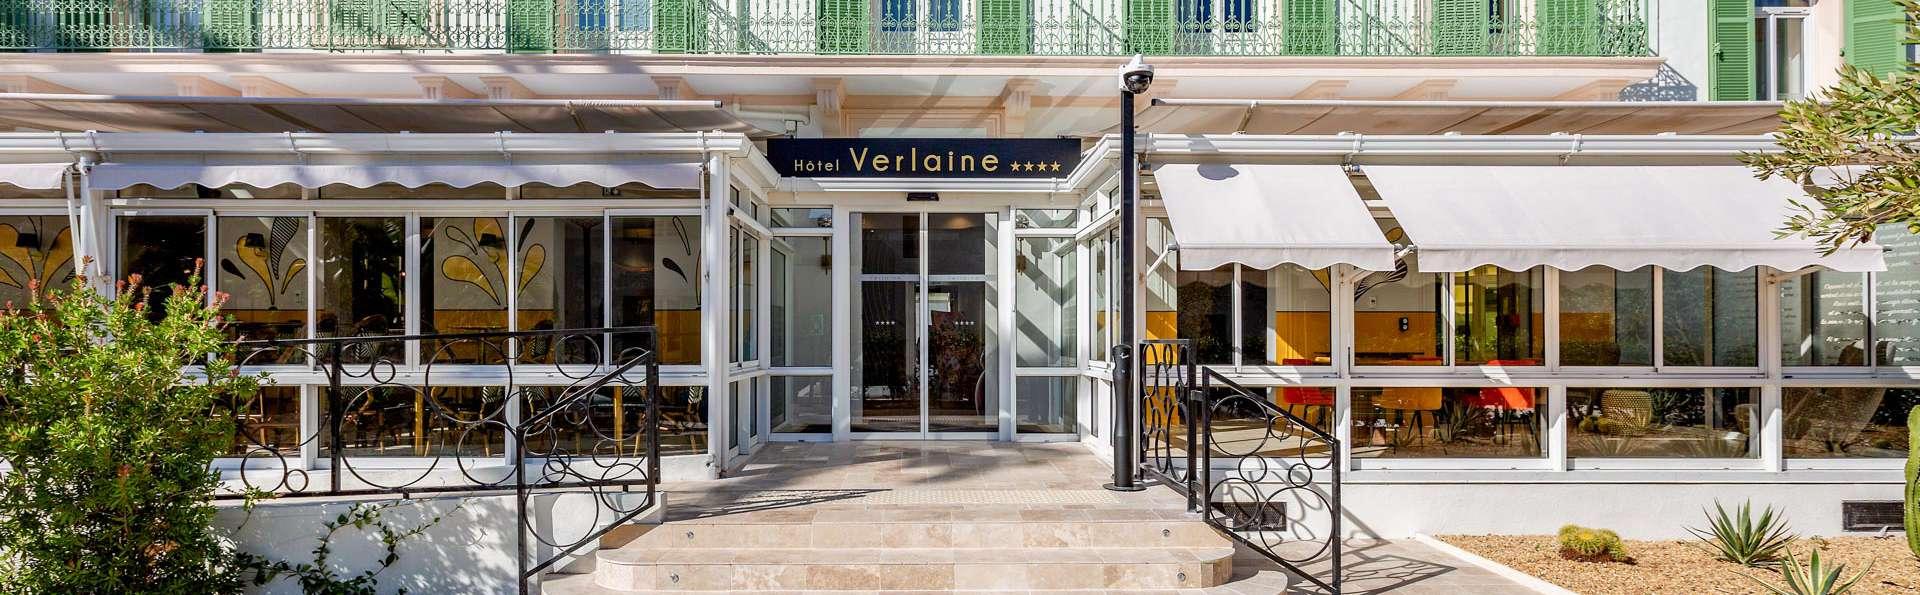 Hôtel Verlaine - EDIT_FRONT_02.jpg